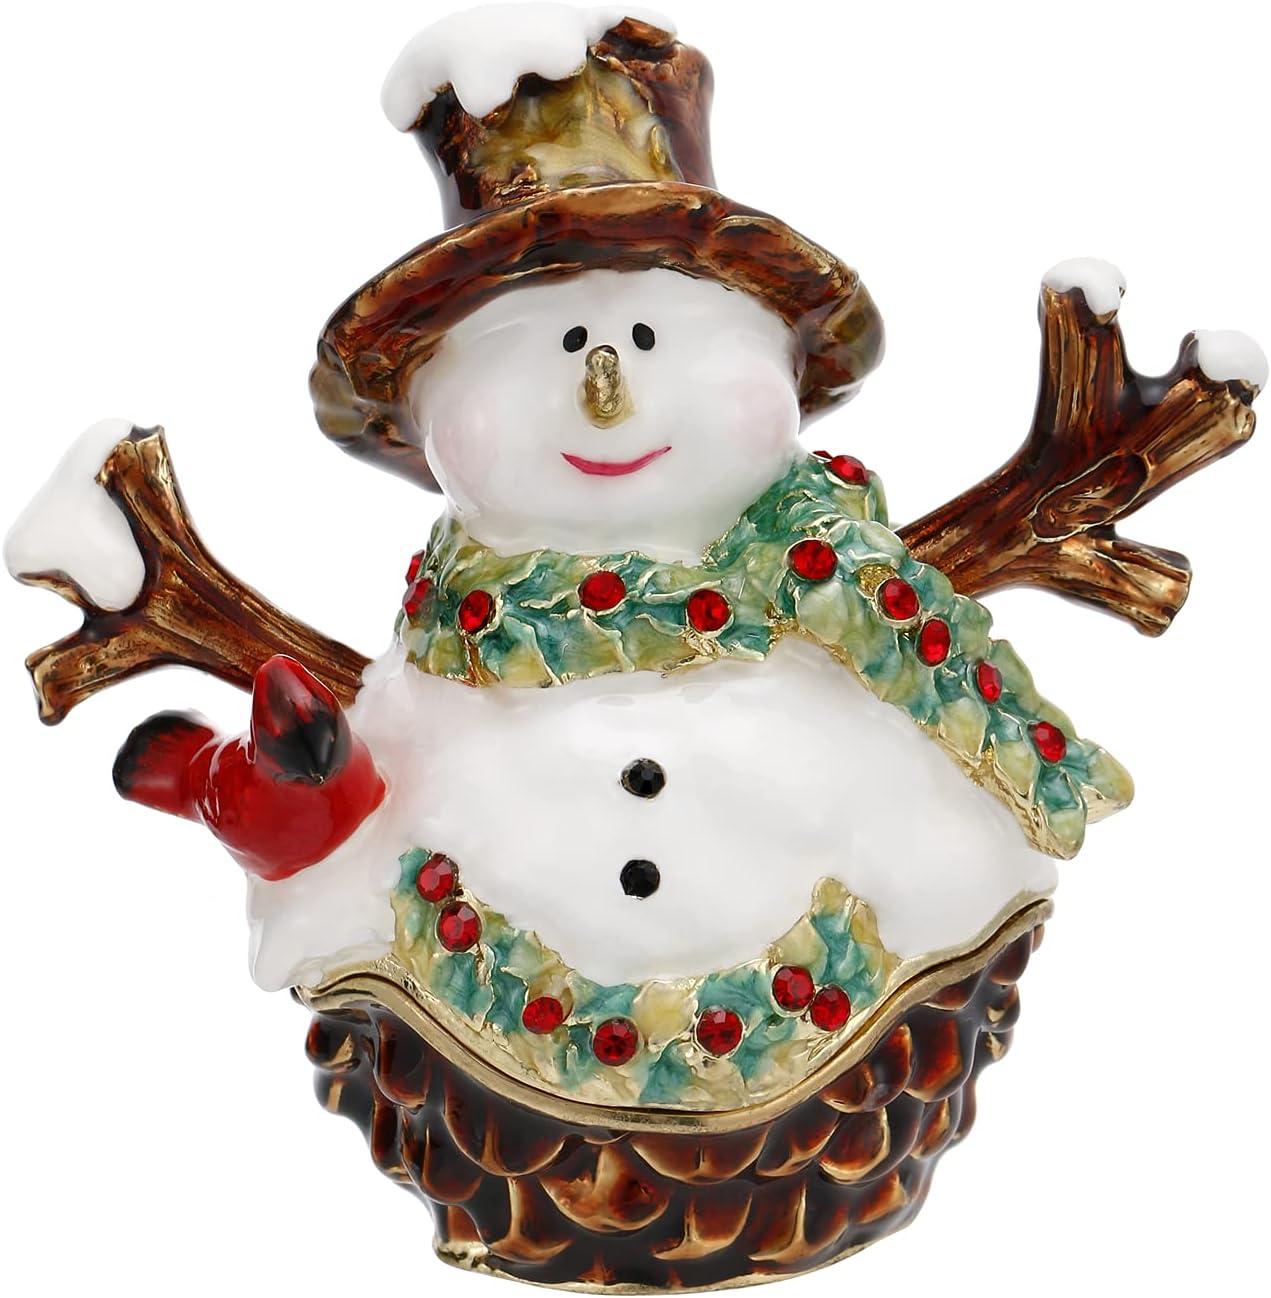 Hand Painted Enamel Christmas Snowman Trinket Box, Hinged Jewelry Organizer Ring Earrings Storage, Unique Home Decor Figurine Keepsake Collectible, Personalized Elegant Handmade Ornament (Snowman)